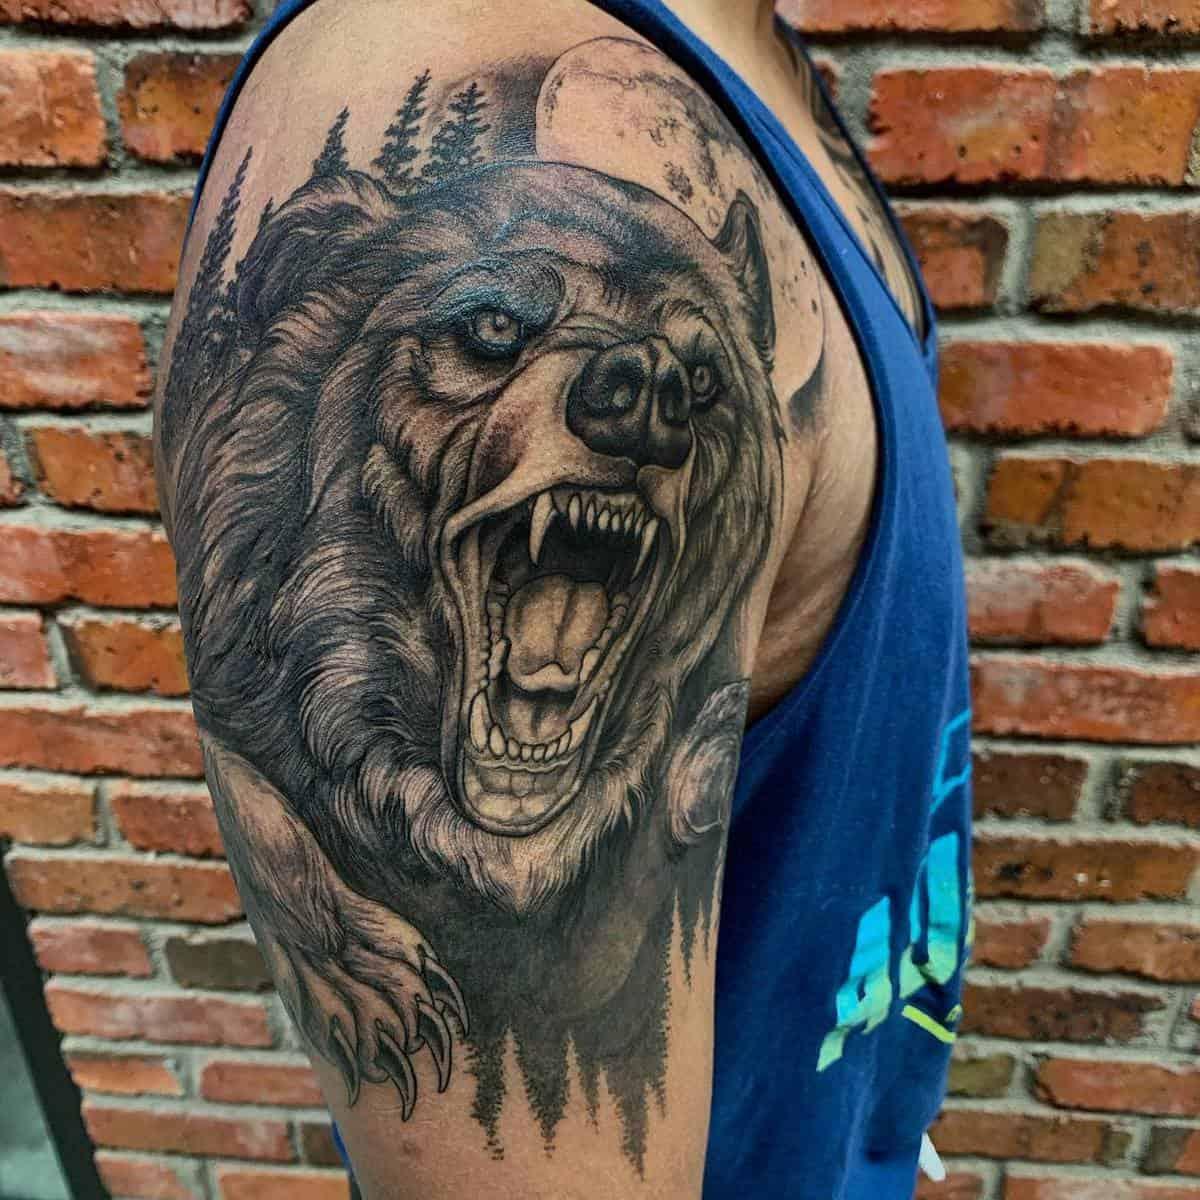 Shoulder Black Bear Tattoo electricdreamscollective